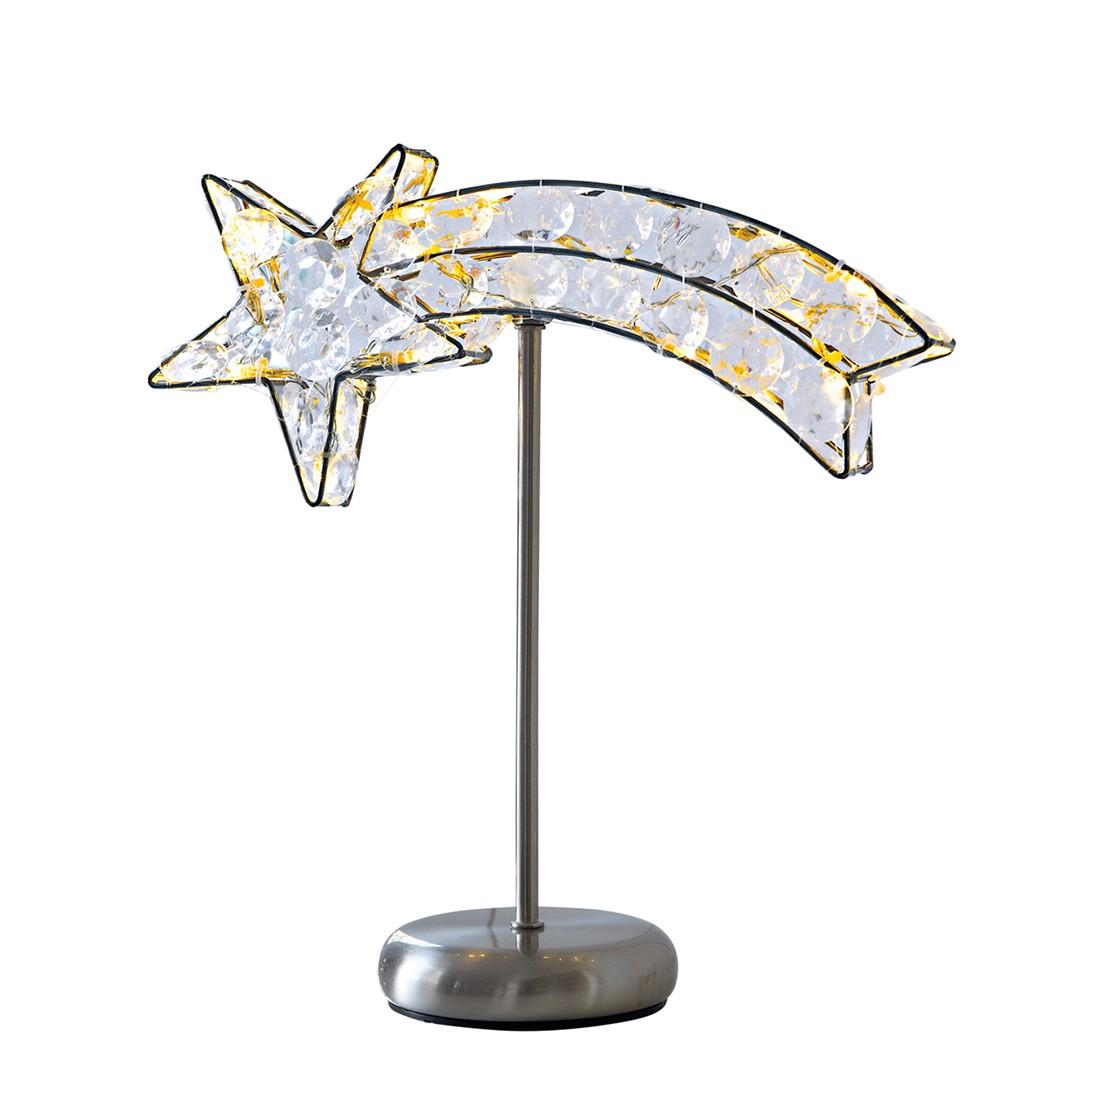 Weihnachtsbeleuchtung Sternschnuppe ● Metall/Kunststoff ● Silber- Pure Day